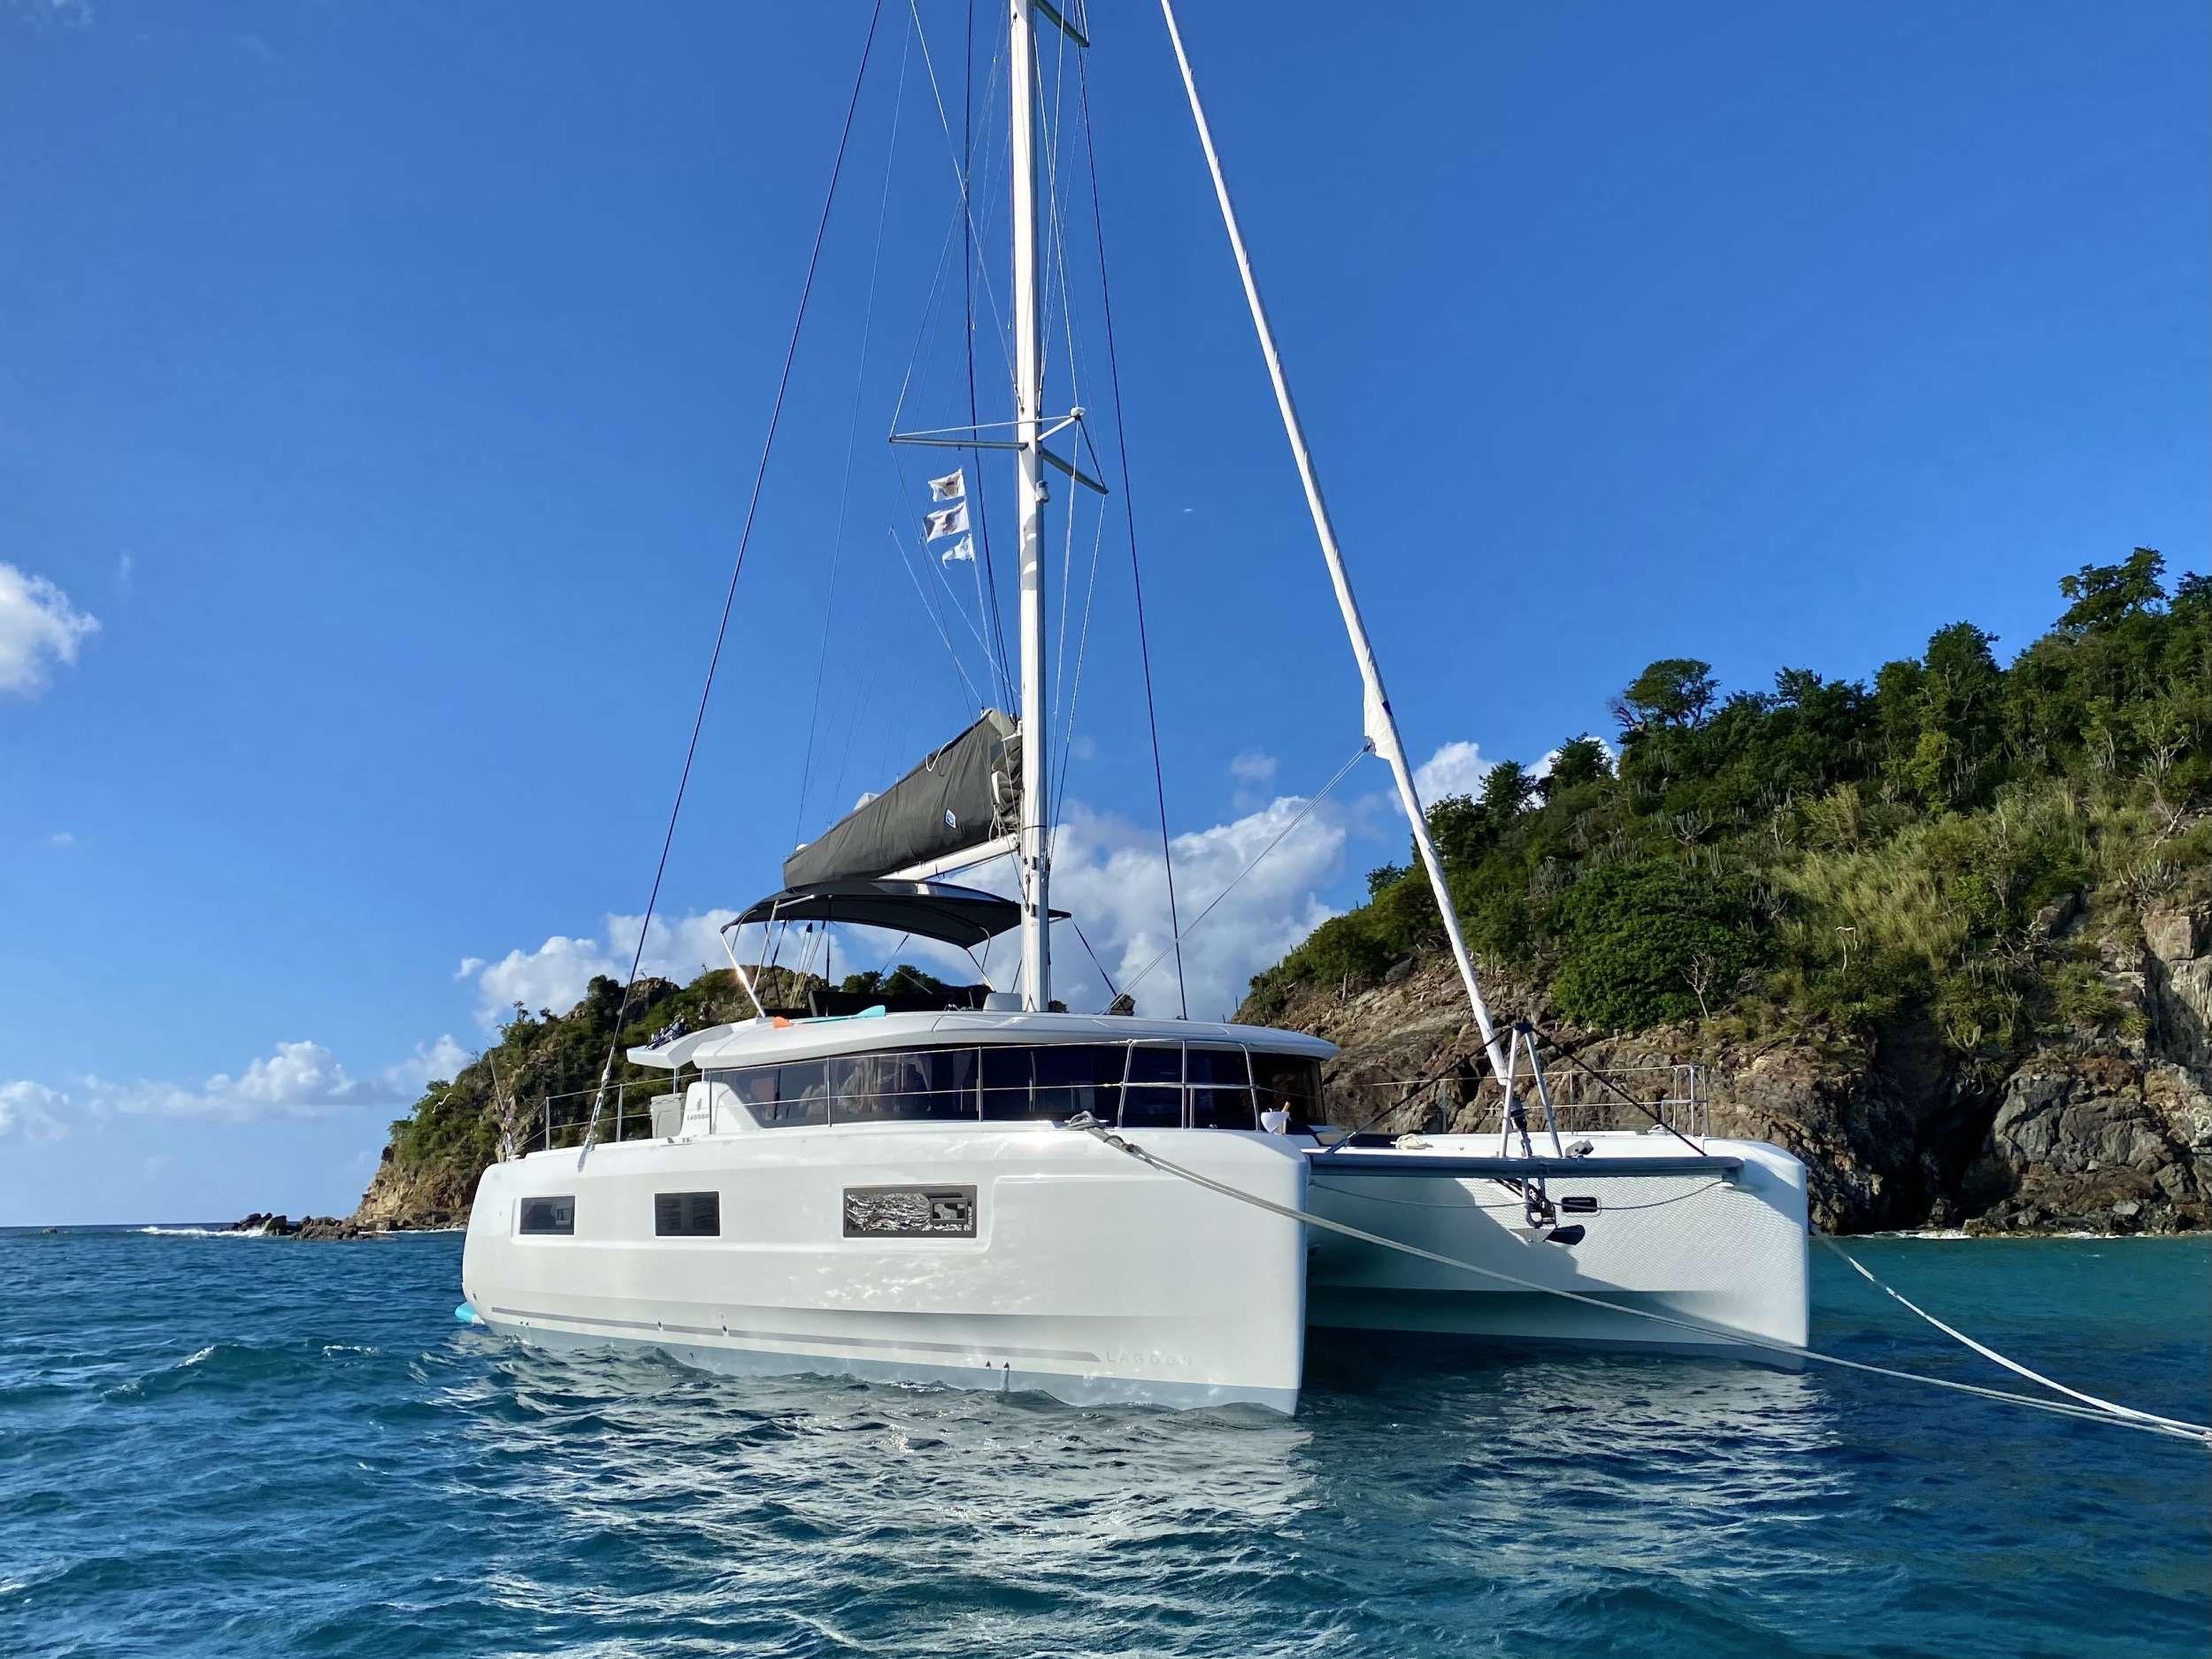 RENDEZ-VOUS - Lagoon 46 - 3 Cabins - St Thomas - Virgin Islands